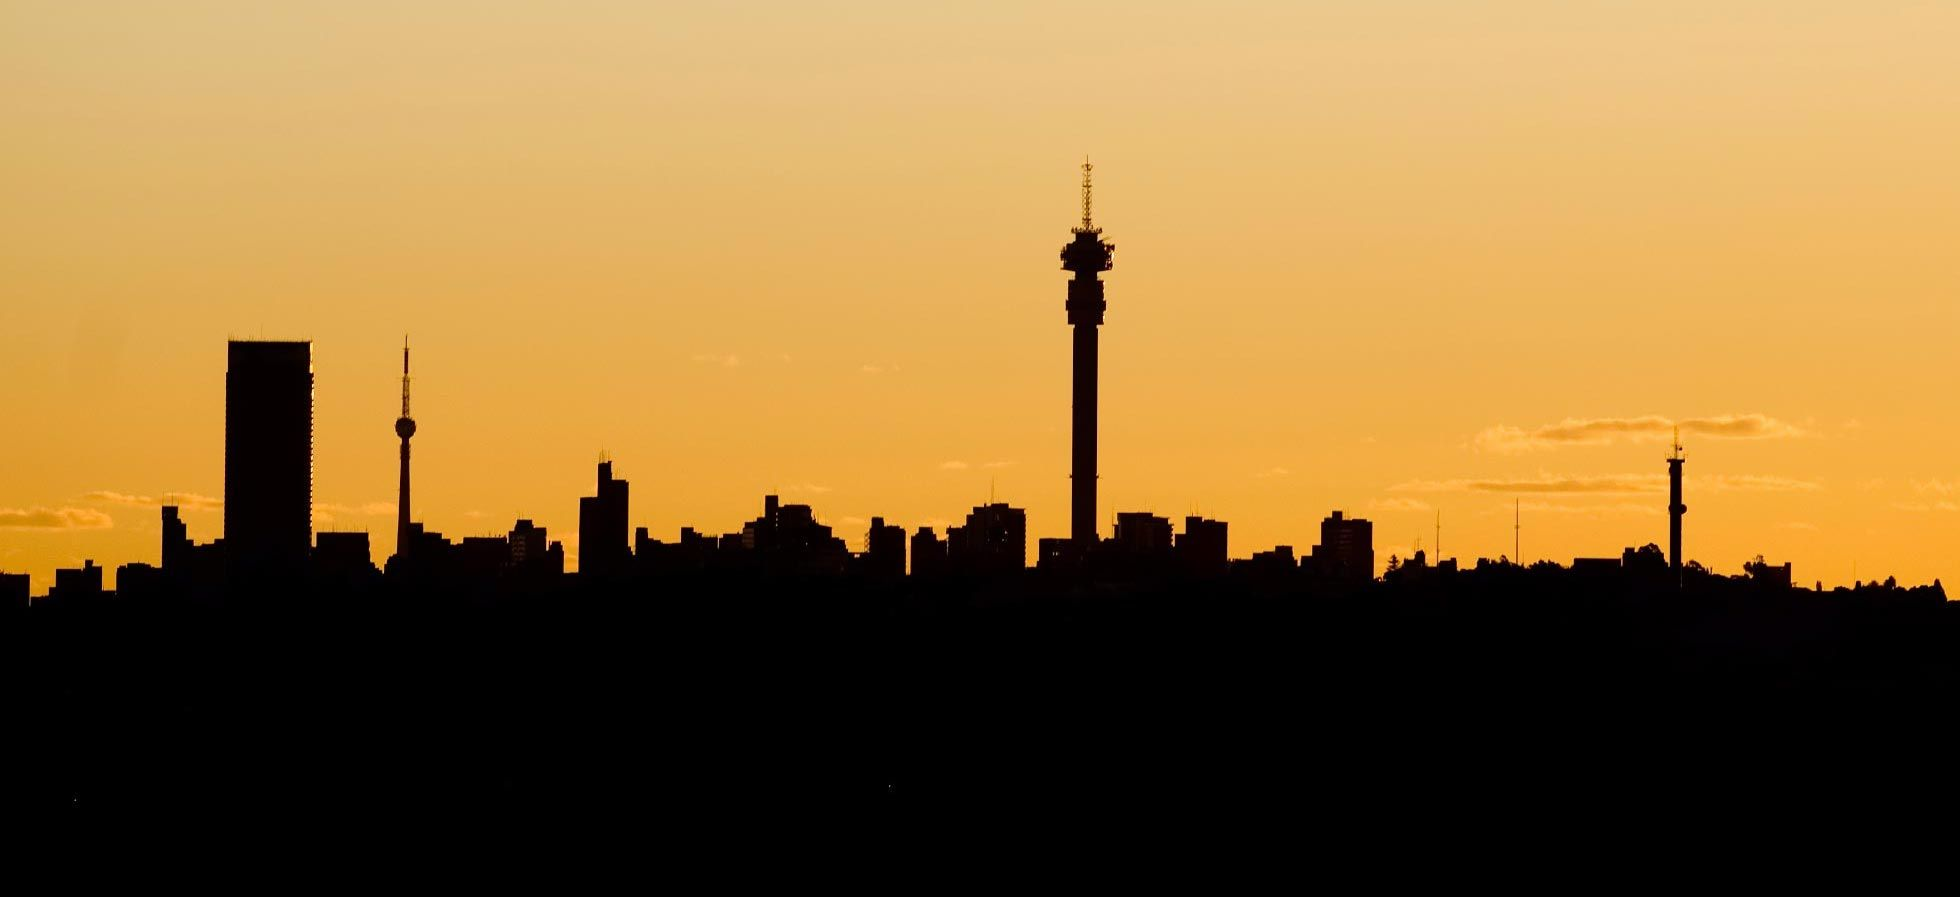 Johannesburg skyline google search amo product inspiration johannesburg skyline google search altavistaventures Images